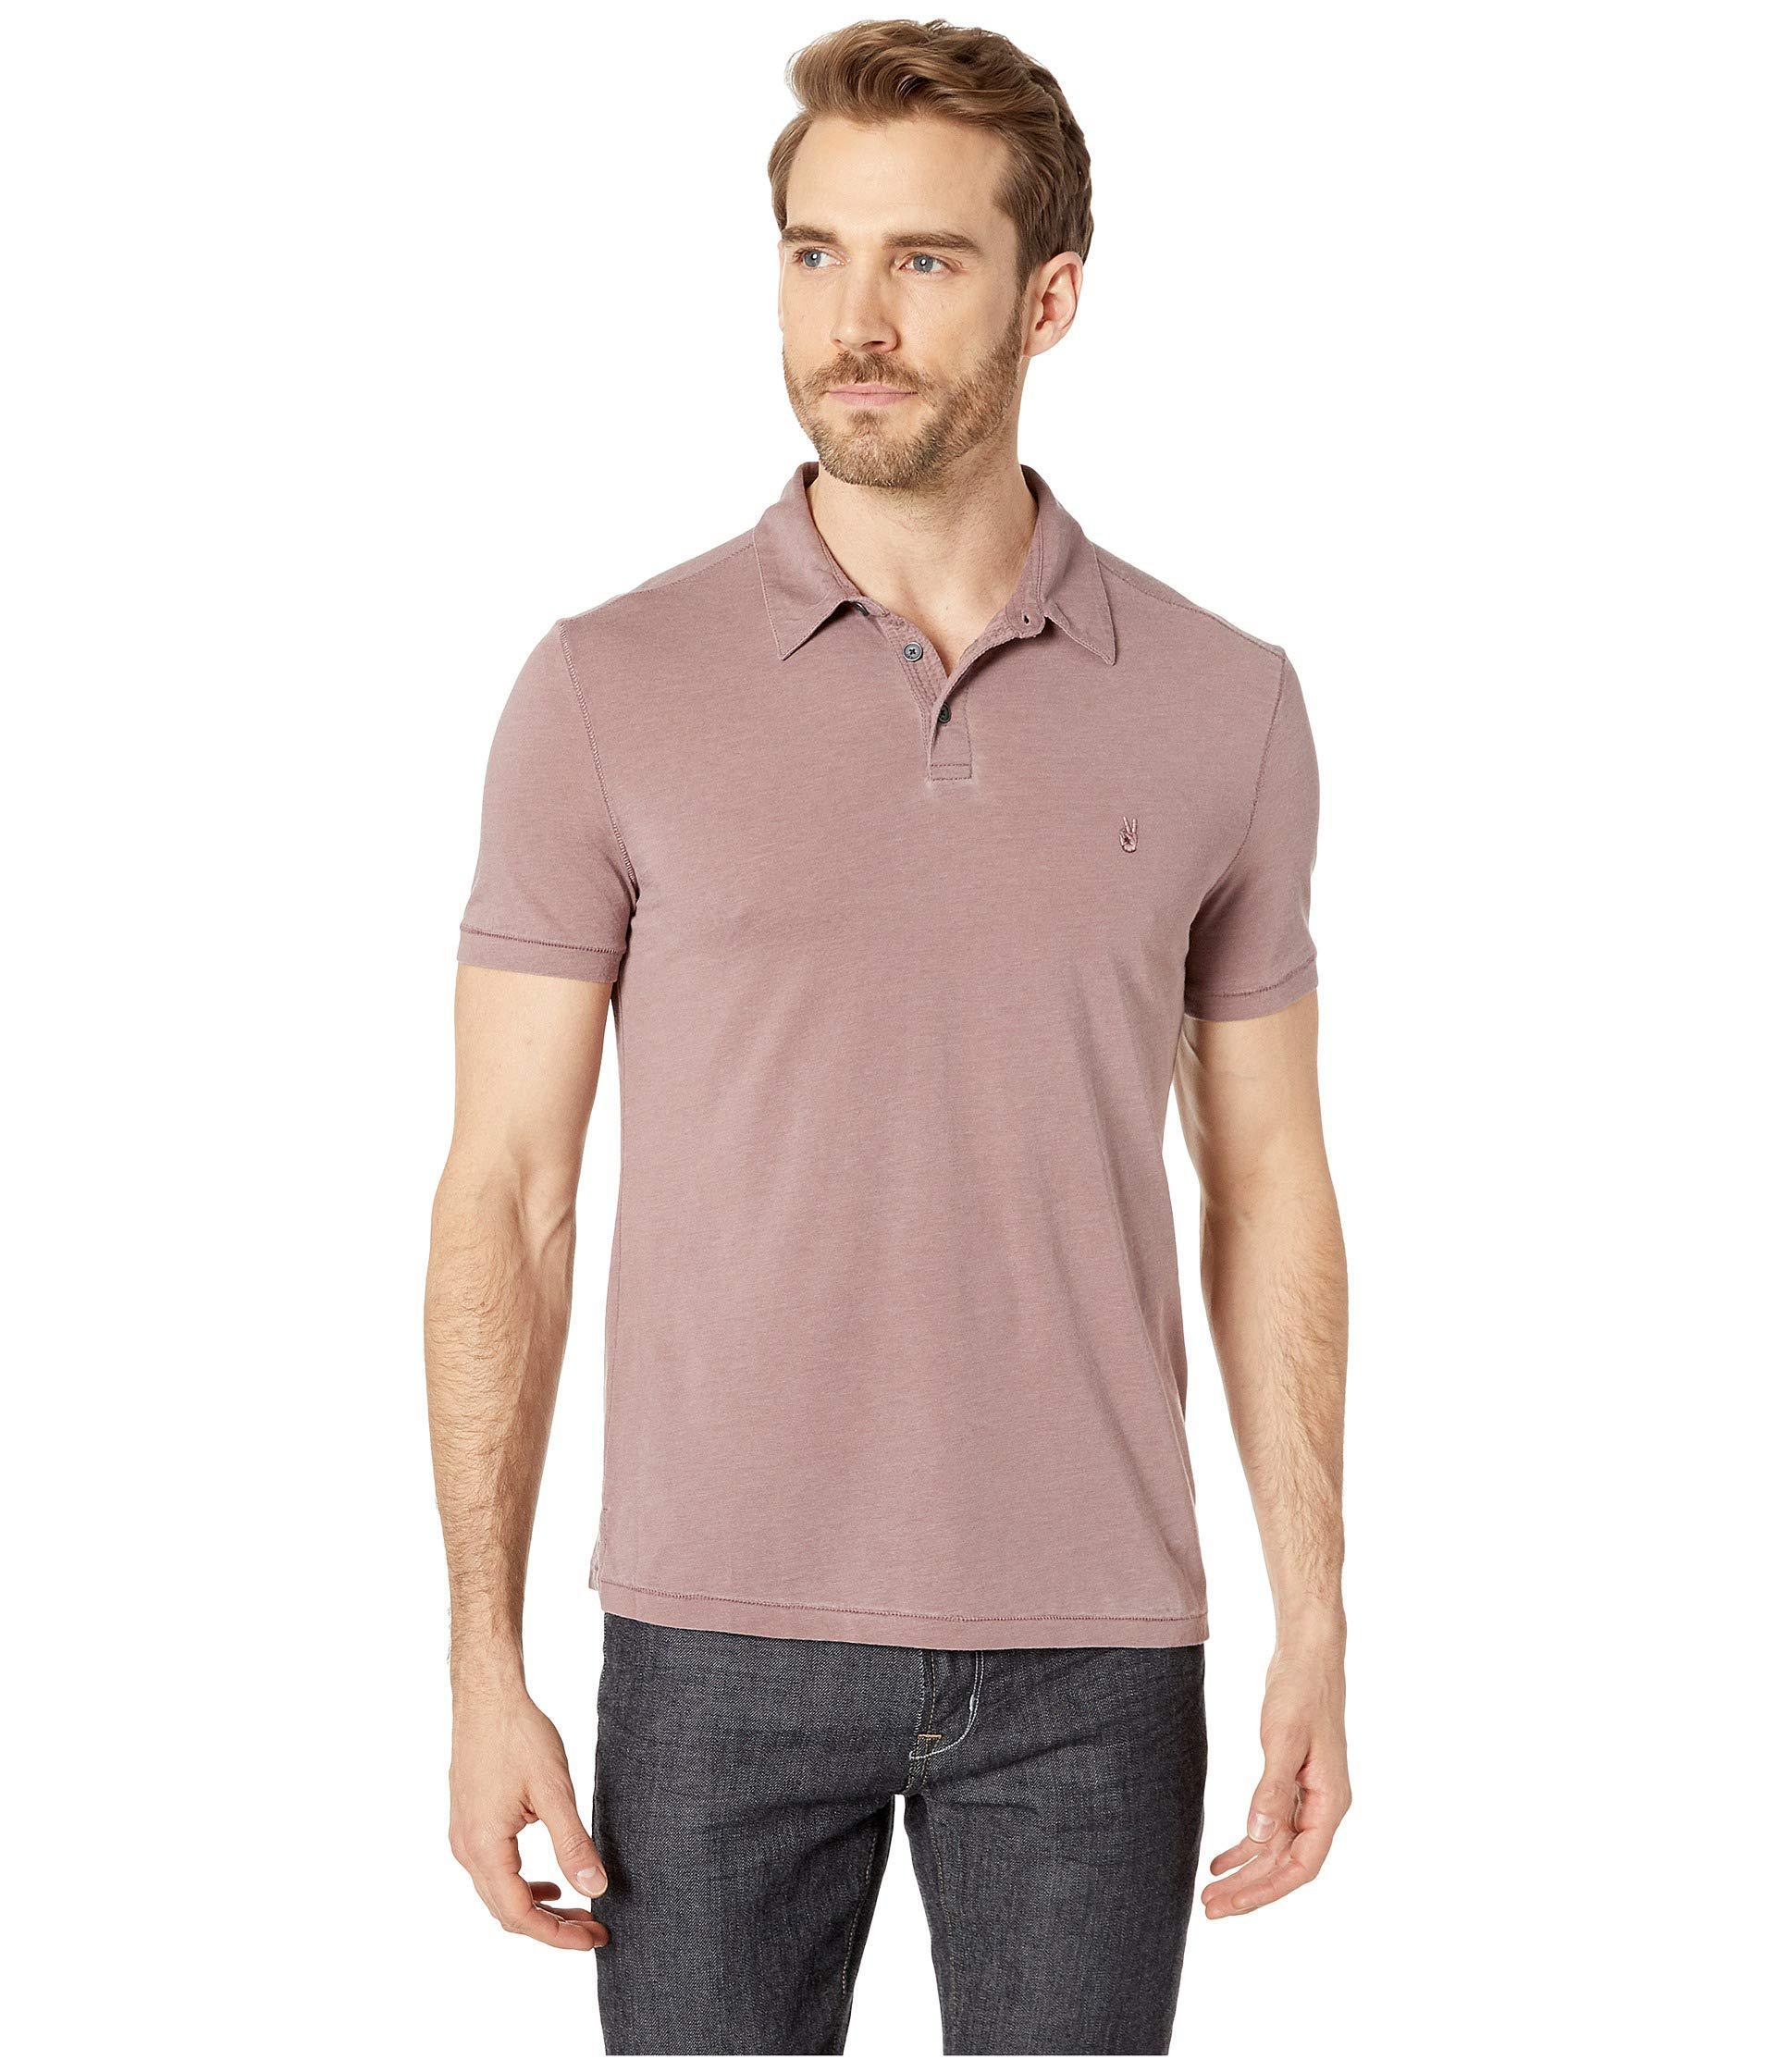 83af6641 John Varvatos. Purple Short Sleeve Burnout Polo With Peace Sign ...